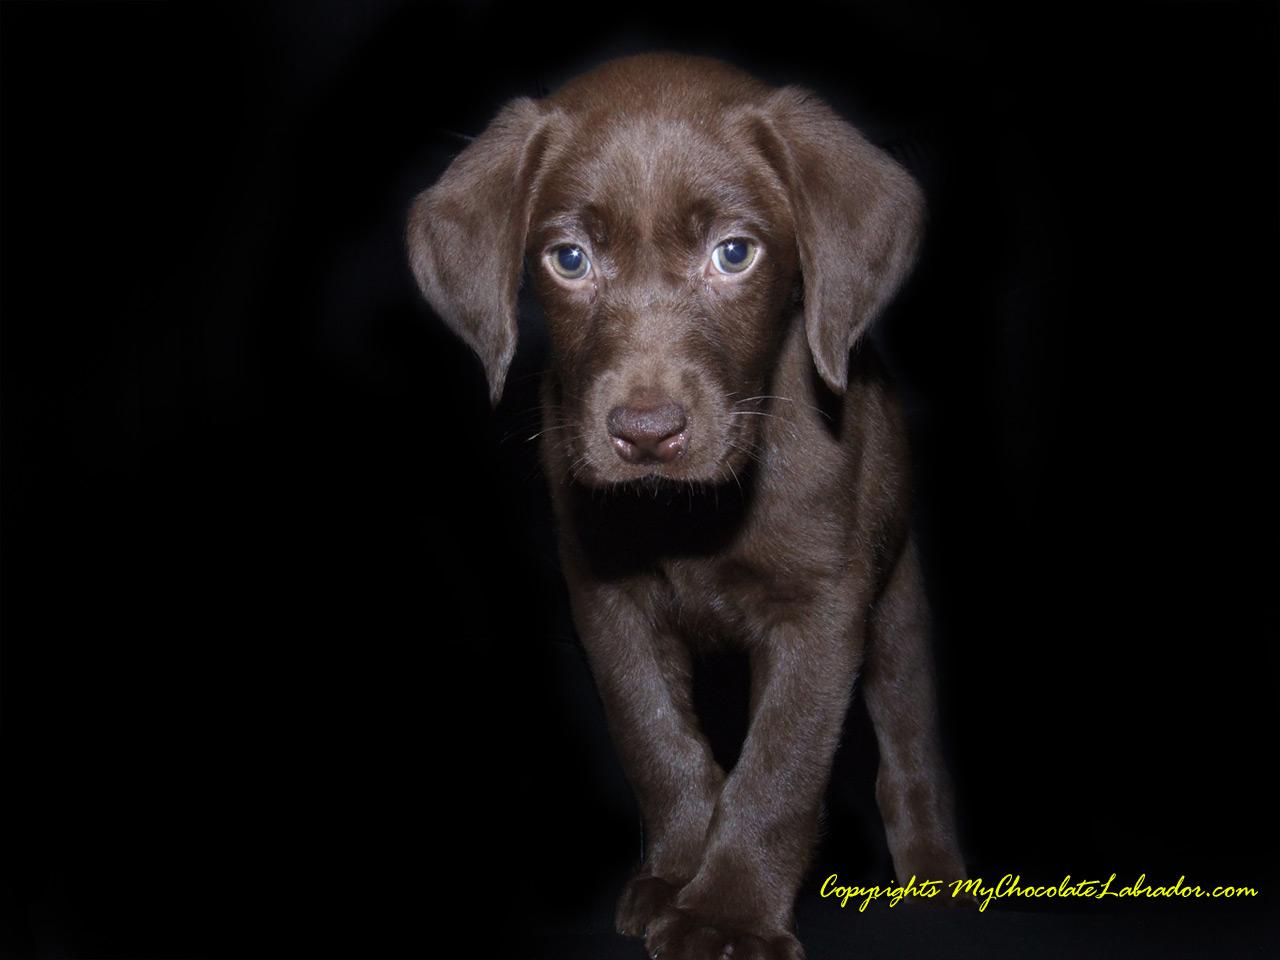 Chocolate Lab Puppy Wallpaper 1280x960